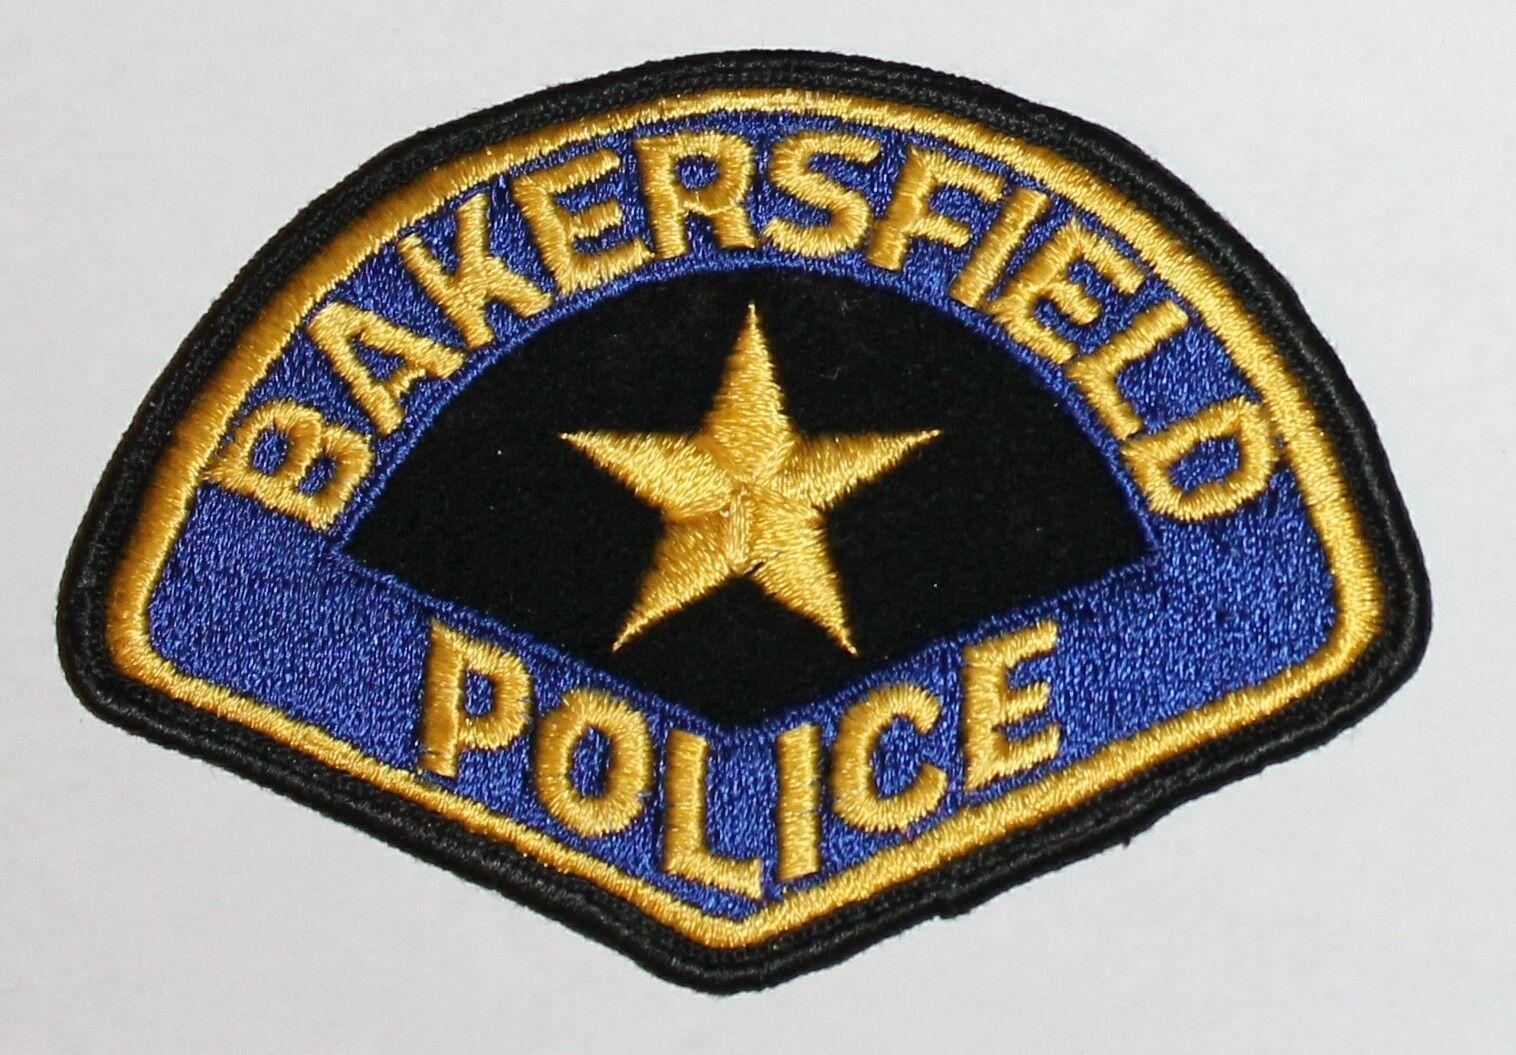 Old 1956 Ura Race Program Bakersfield Speedway Bakersfield California Very Rare 9 99 Kern County California Bakersfield California Kern County